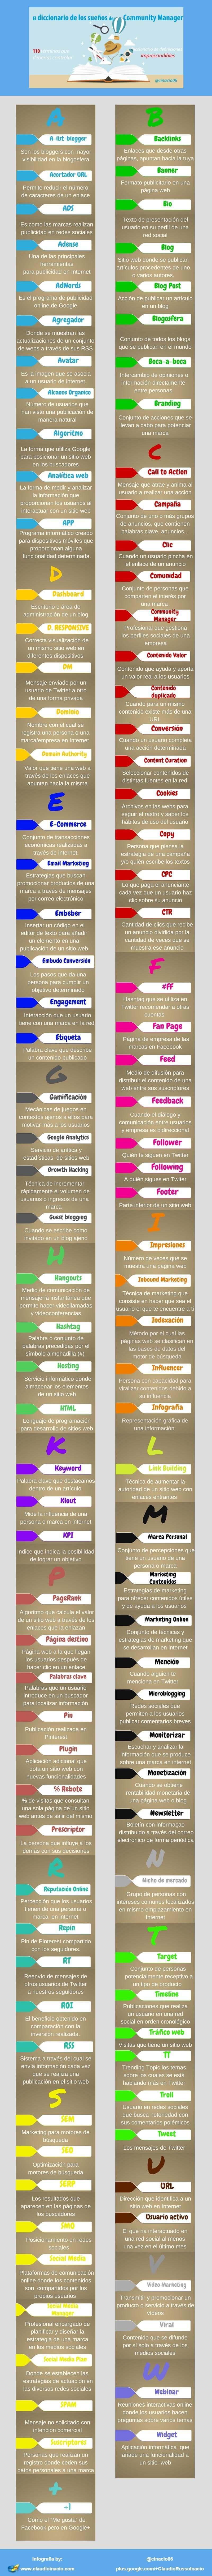 Infografia Diccionario del Community Manager